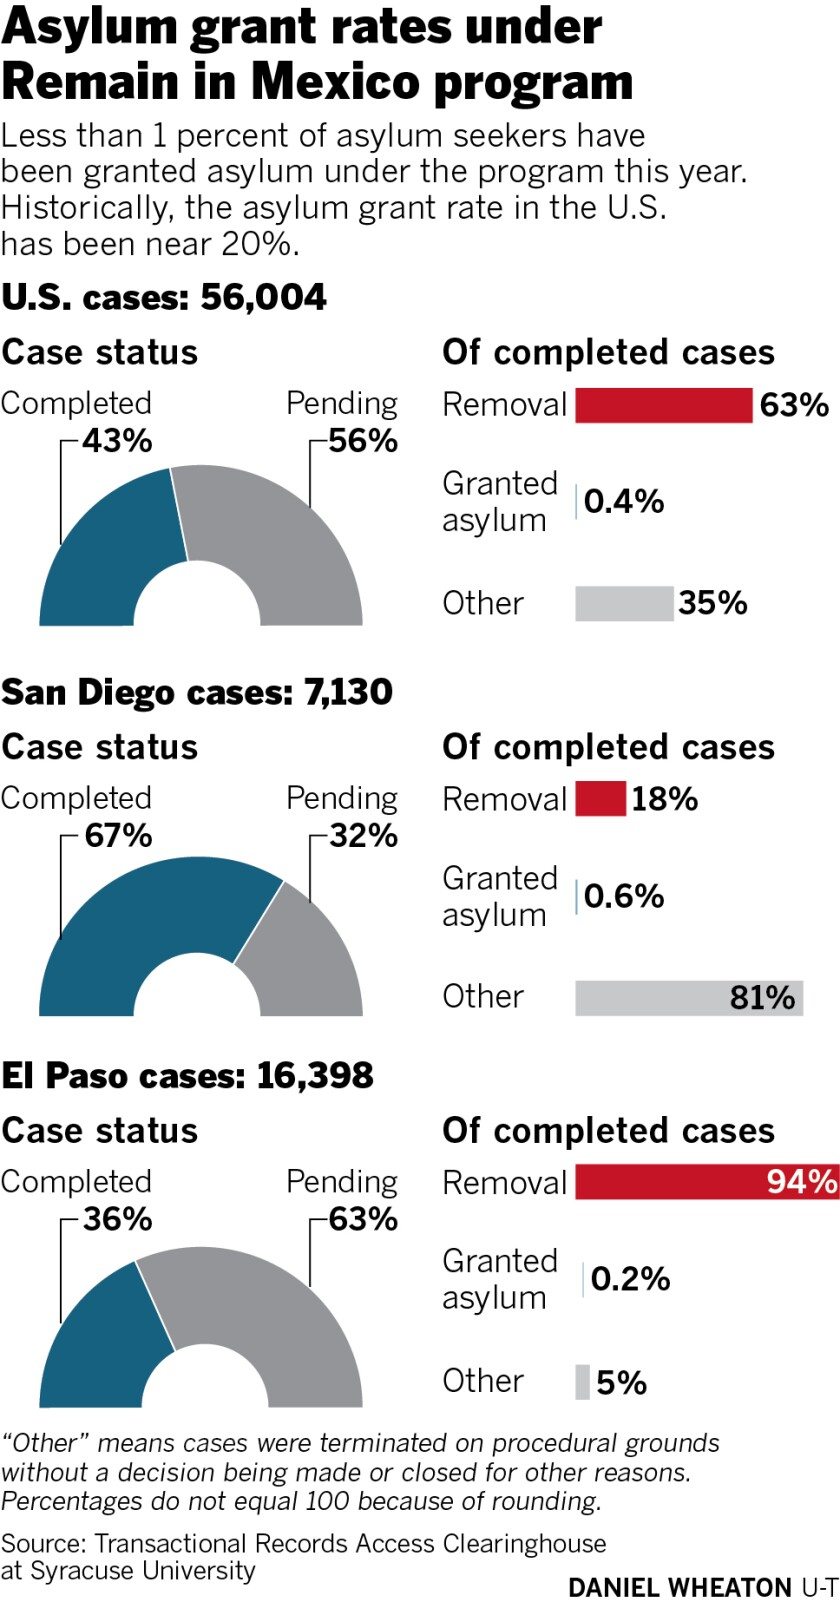 476708-sd-me-asylum-grant-rates-01.jpg